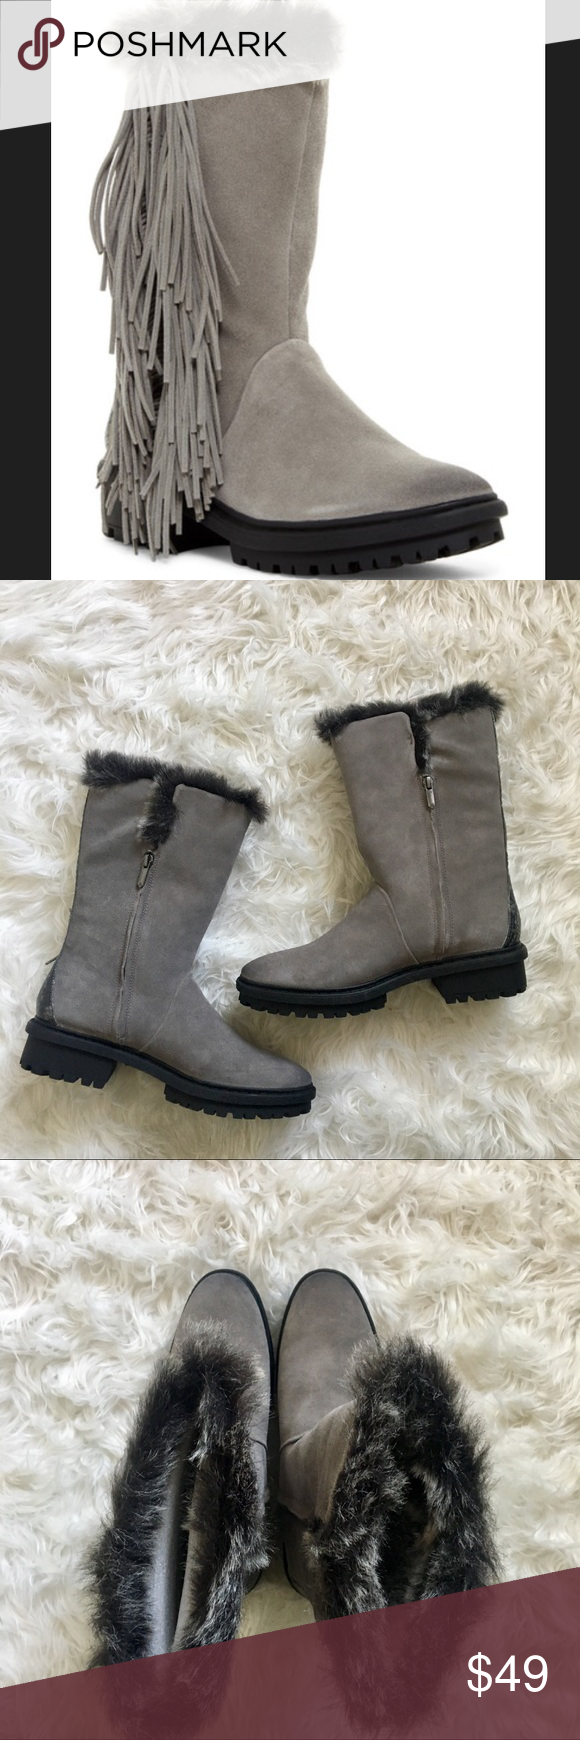 da5296d988f346 SAM EDELMAN TILDEN FAUX FUR SNOW RAIN BOOTS FRINGE A cold-weather boot from  Sam